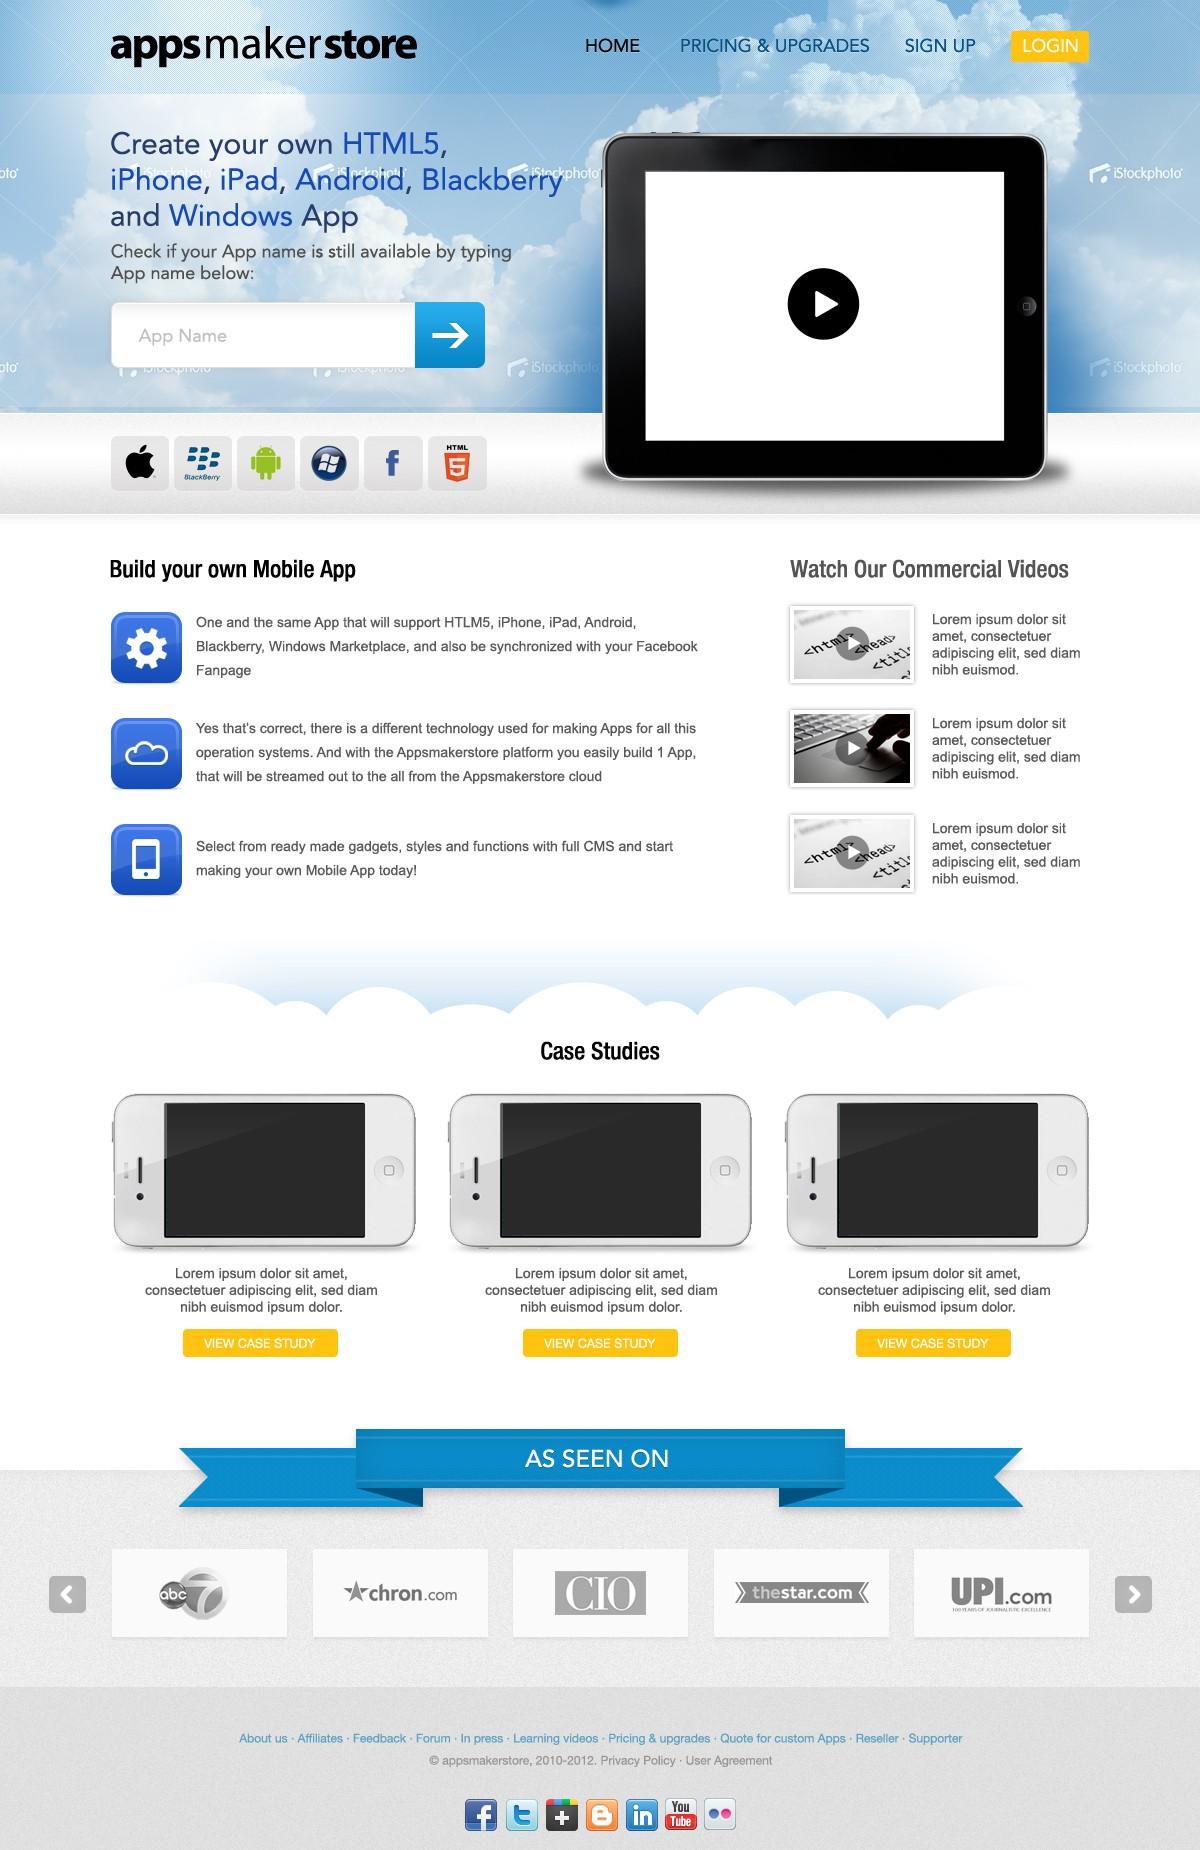 Facelift for Appsmakerstore - The Leading Mobile App Maker!